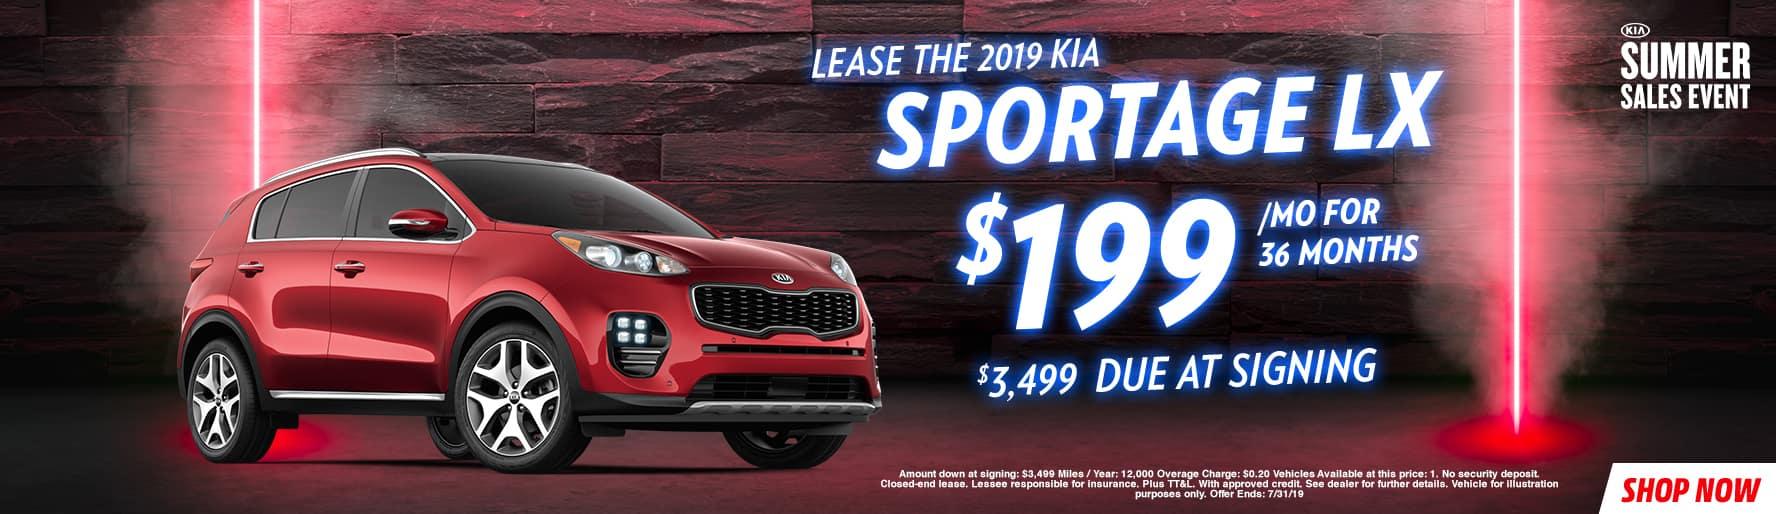 2019_Kia_South_Austin_Sportage_LX_Sales